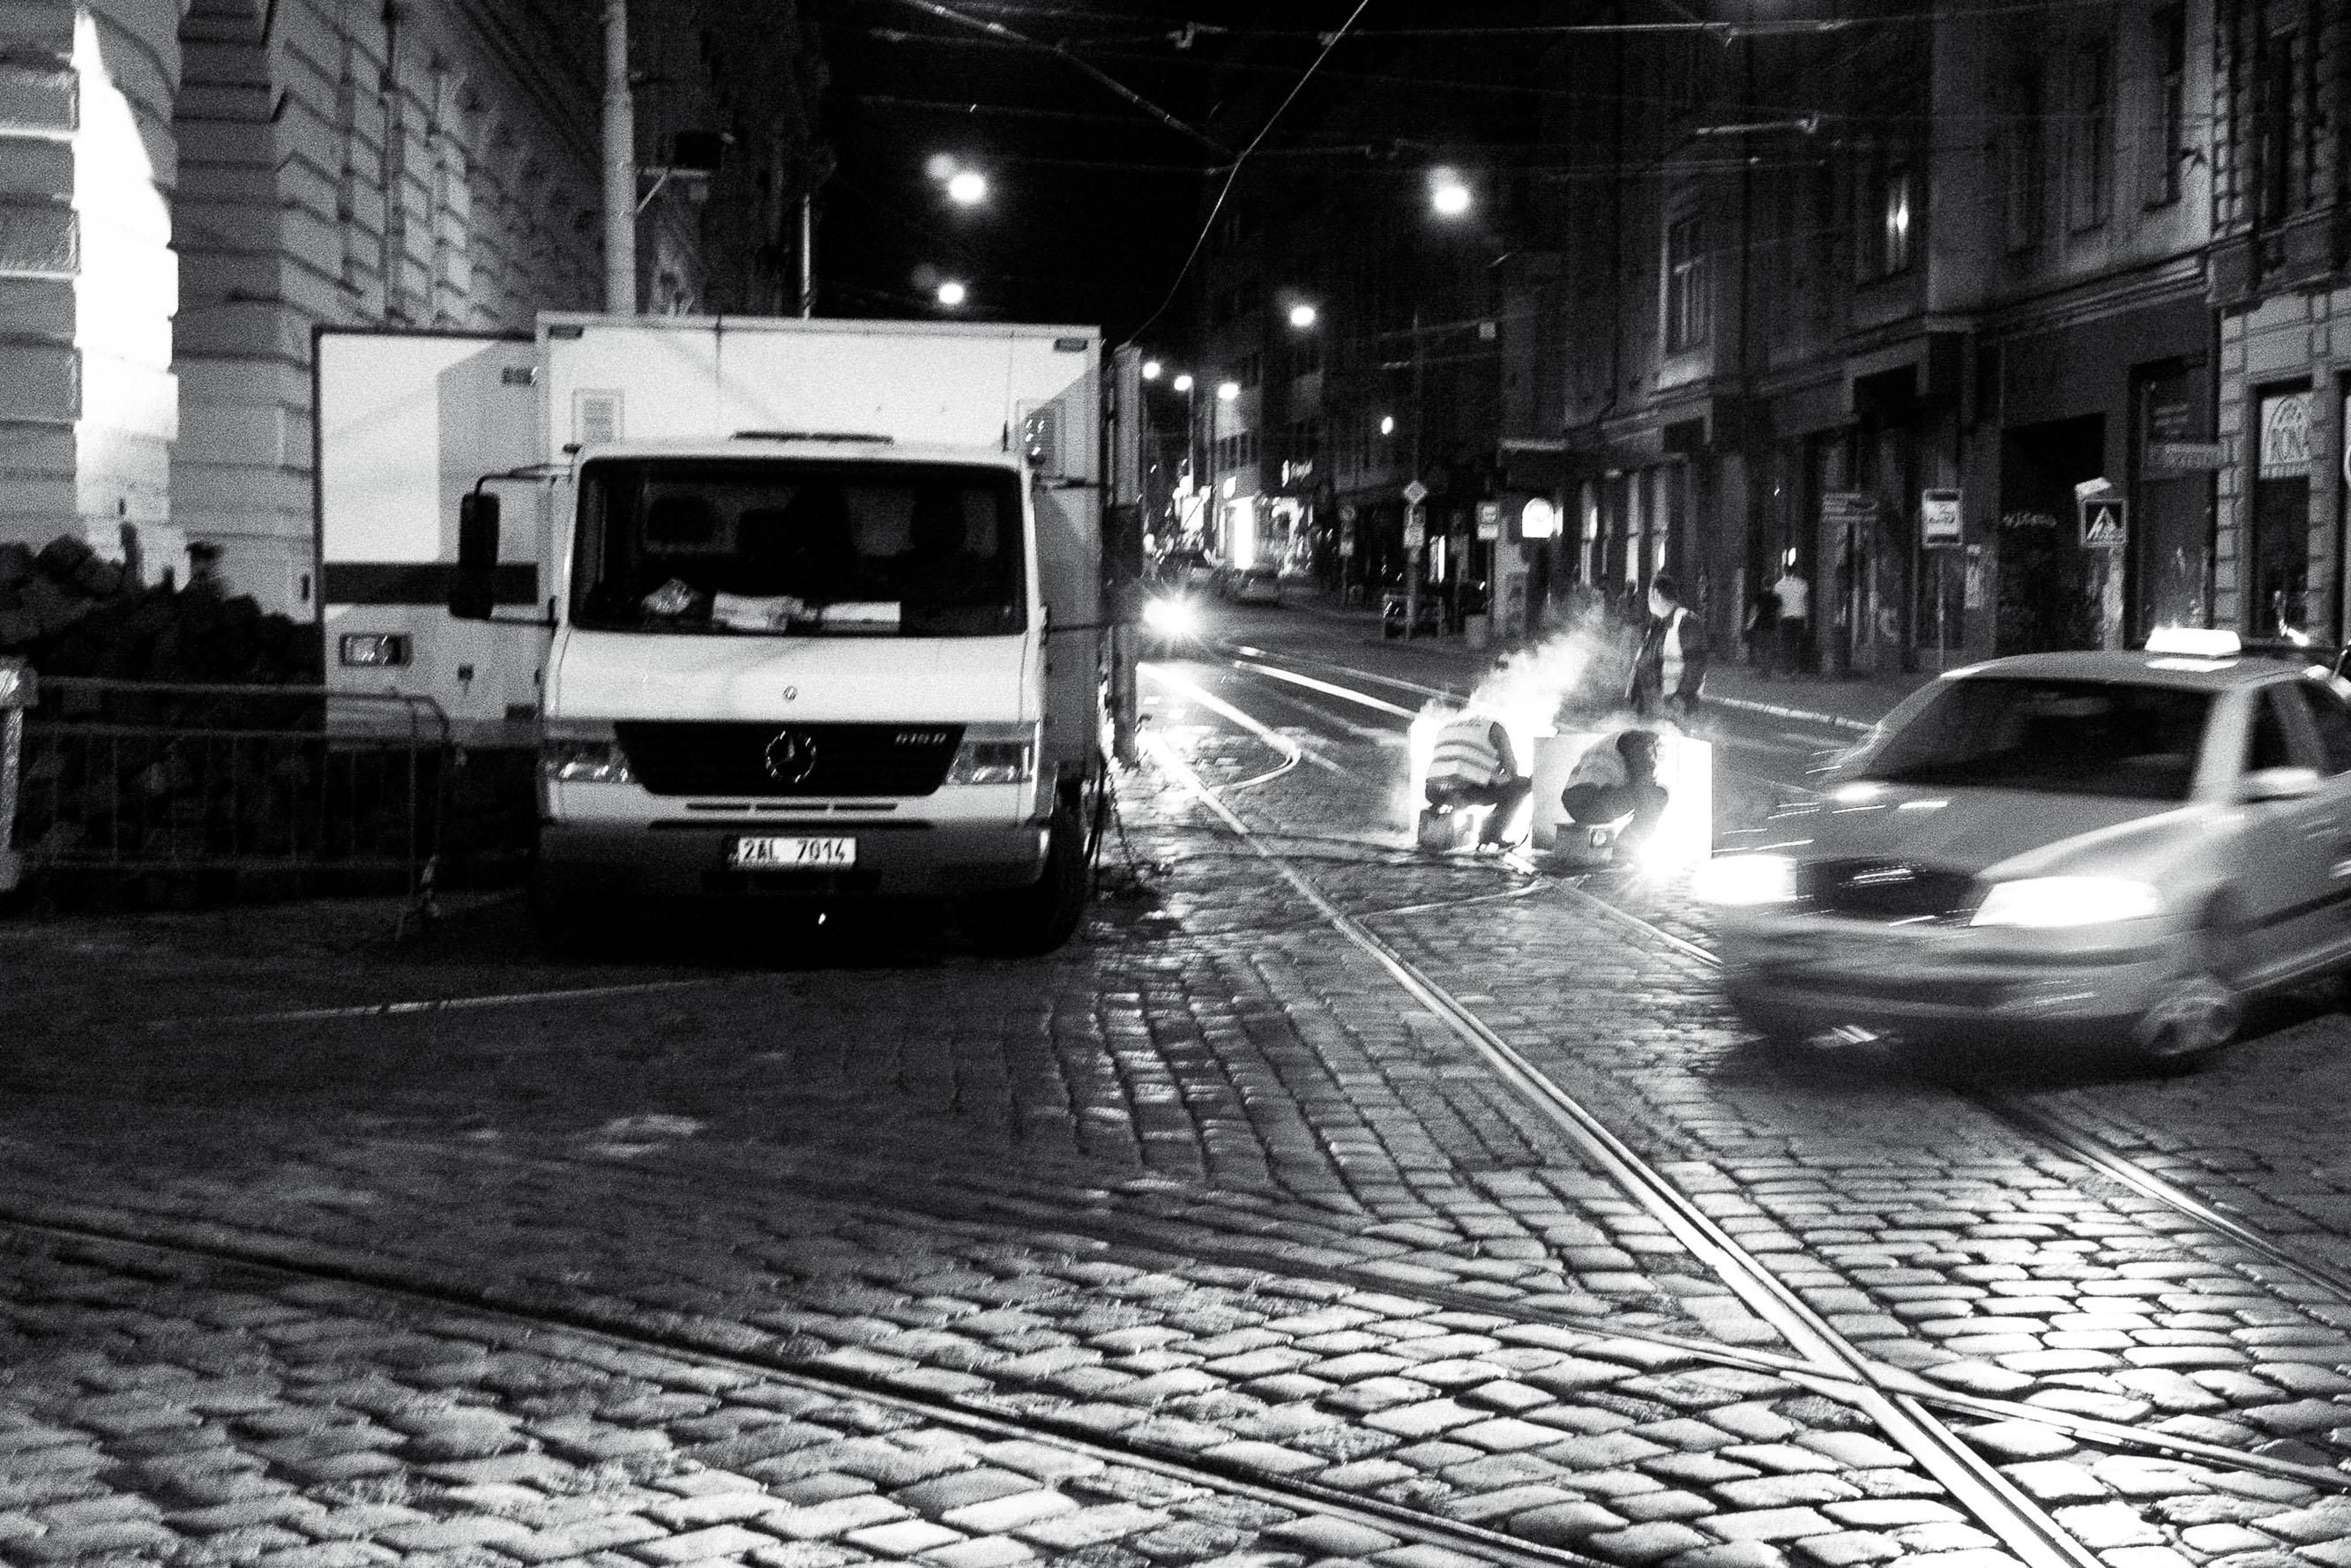 Sven-Michael---S-2014--9-[working-streets]---©-Sven-Michael-Golimowski.jpg